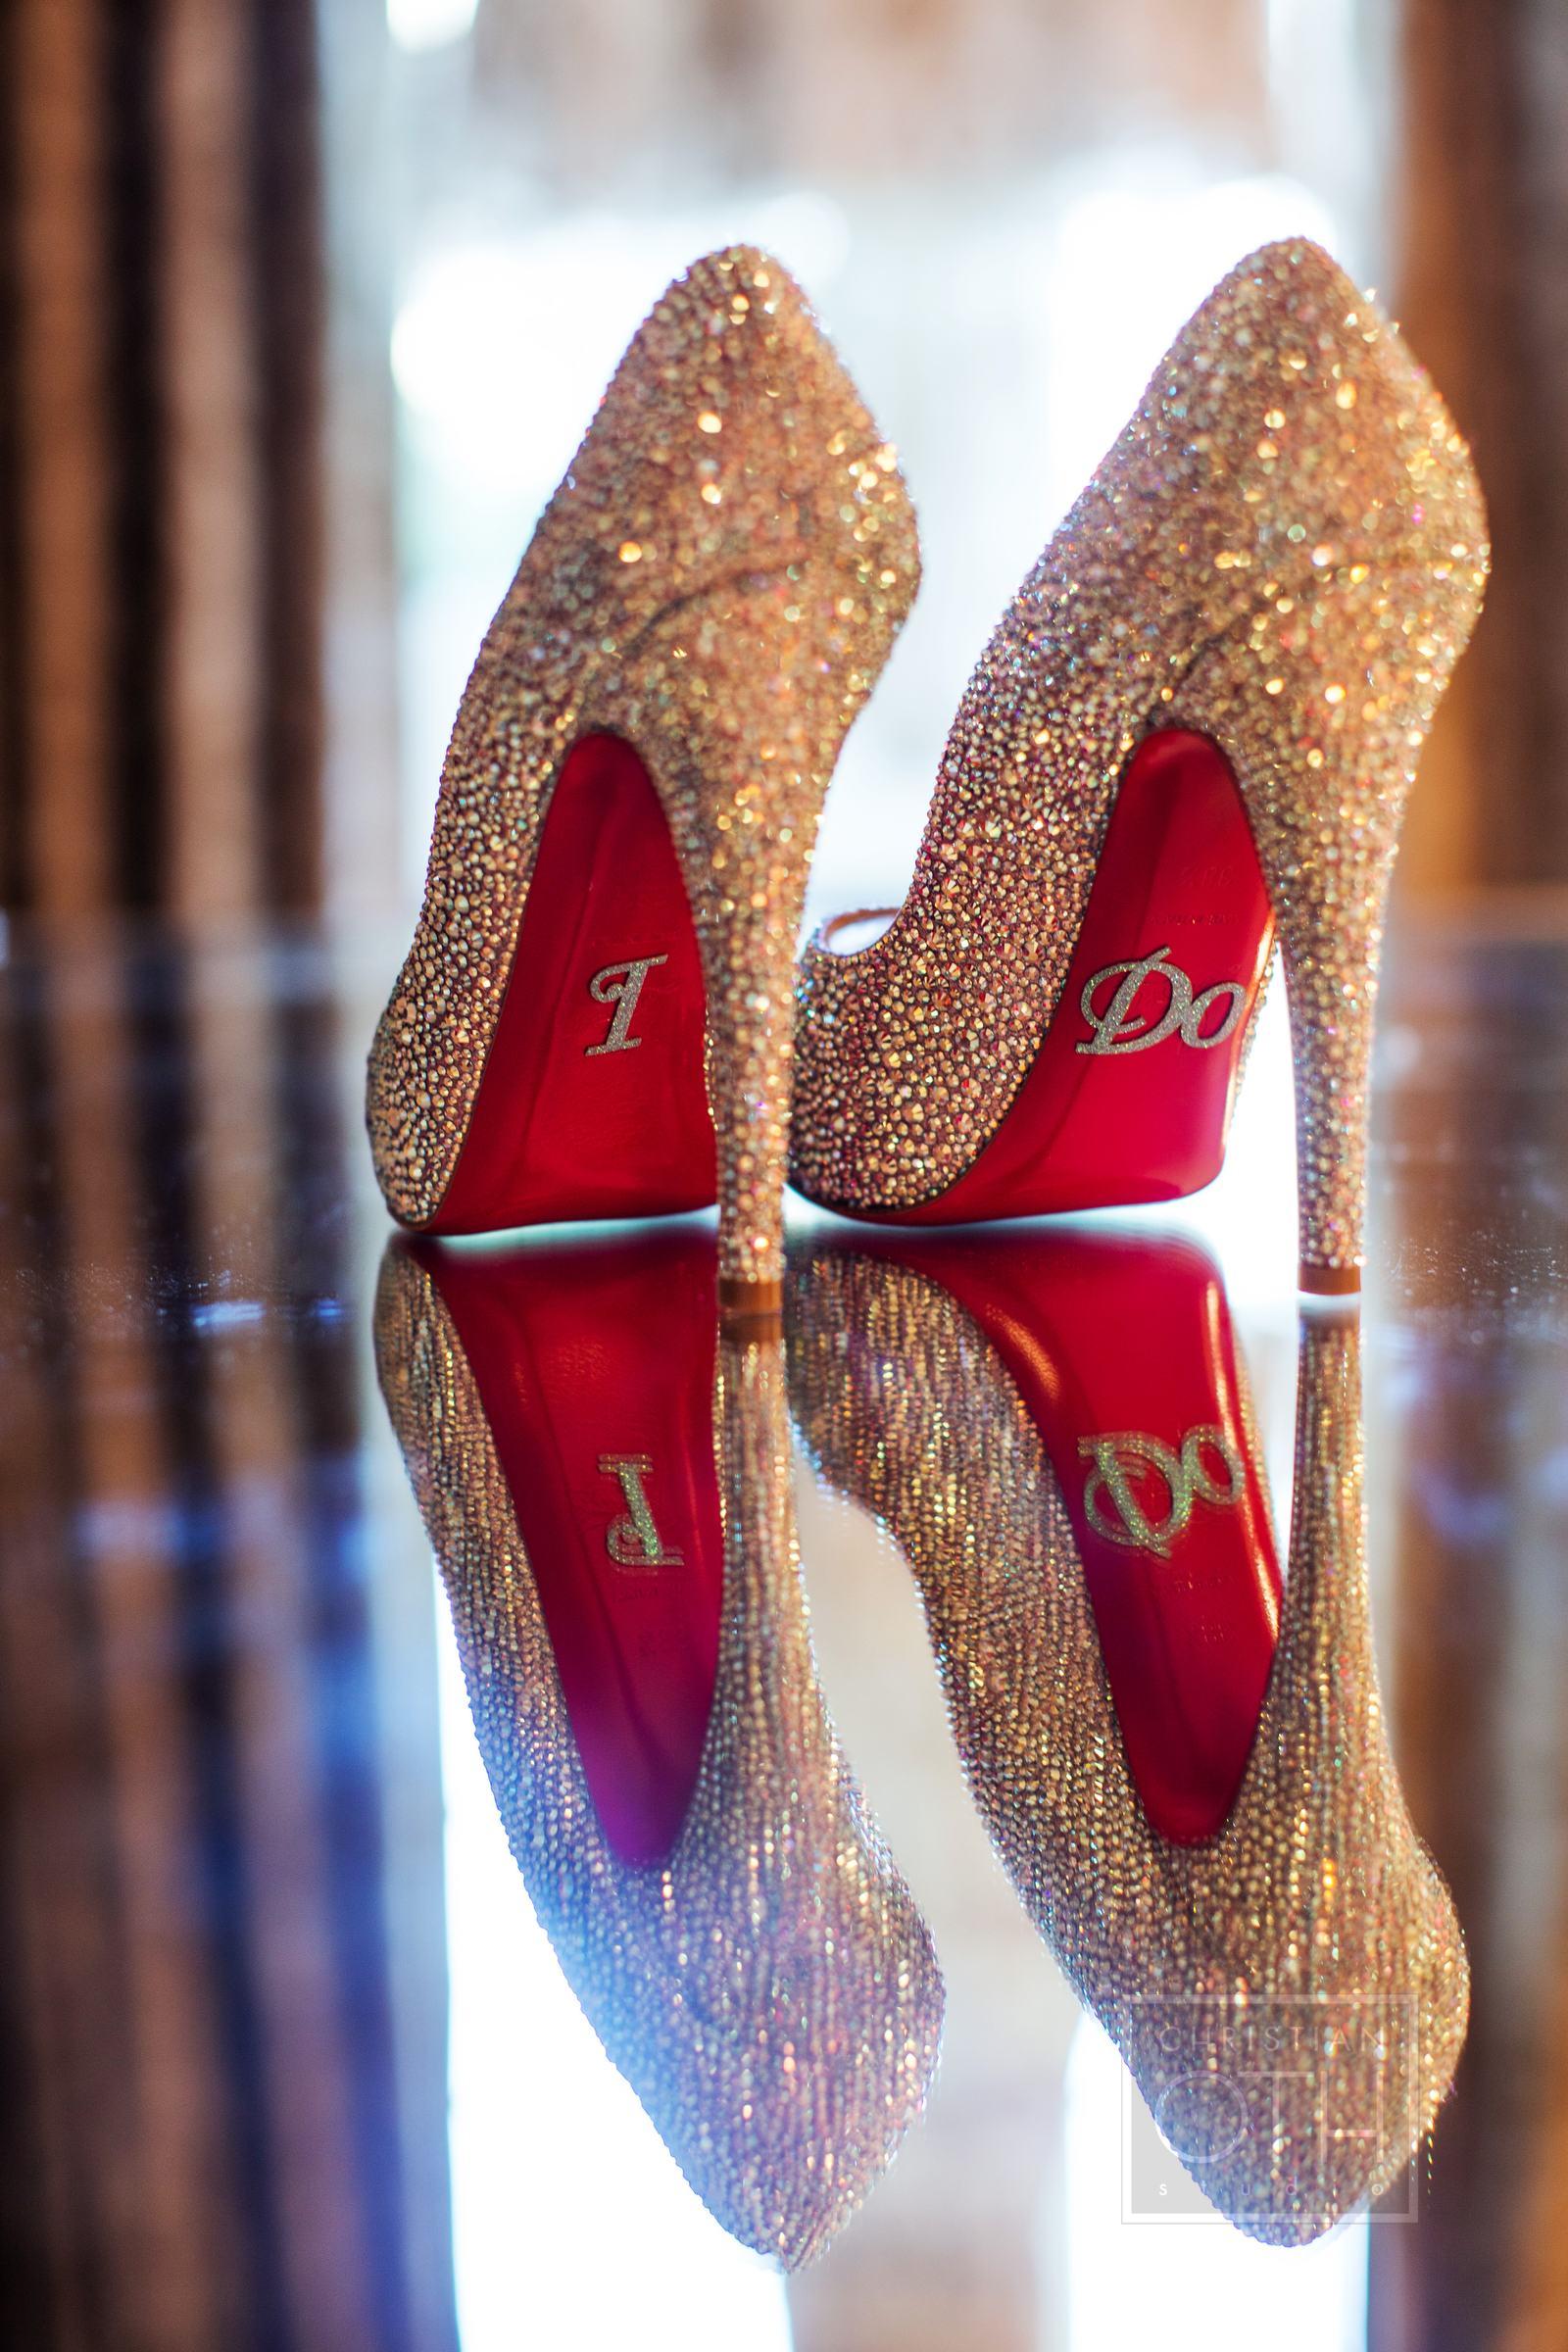 Ceci_New_York_Custom_Invitation_Pierre__City_ Destination_Wedding_Luxury_Personalized_Ceci_Style_Bride_Rose_Gold_Foil_Stamping10.JPG